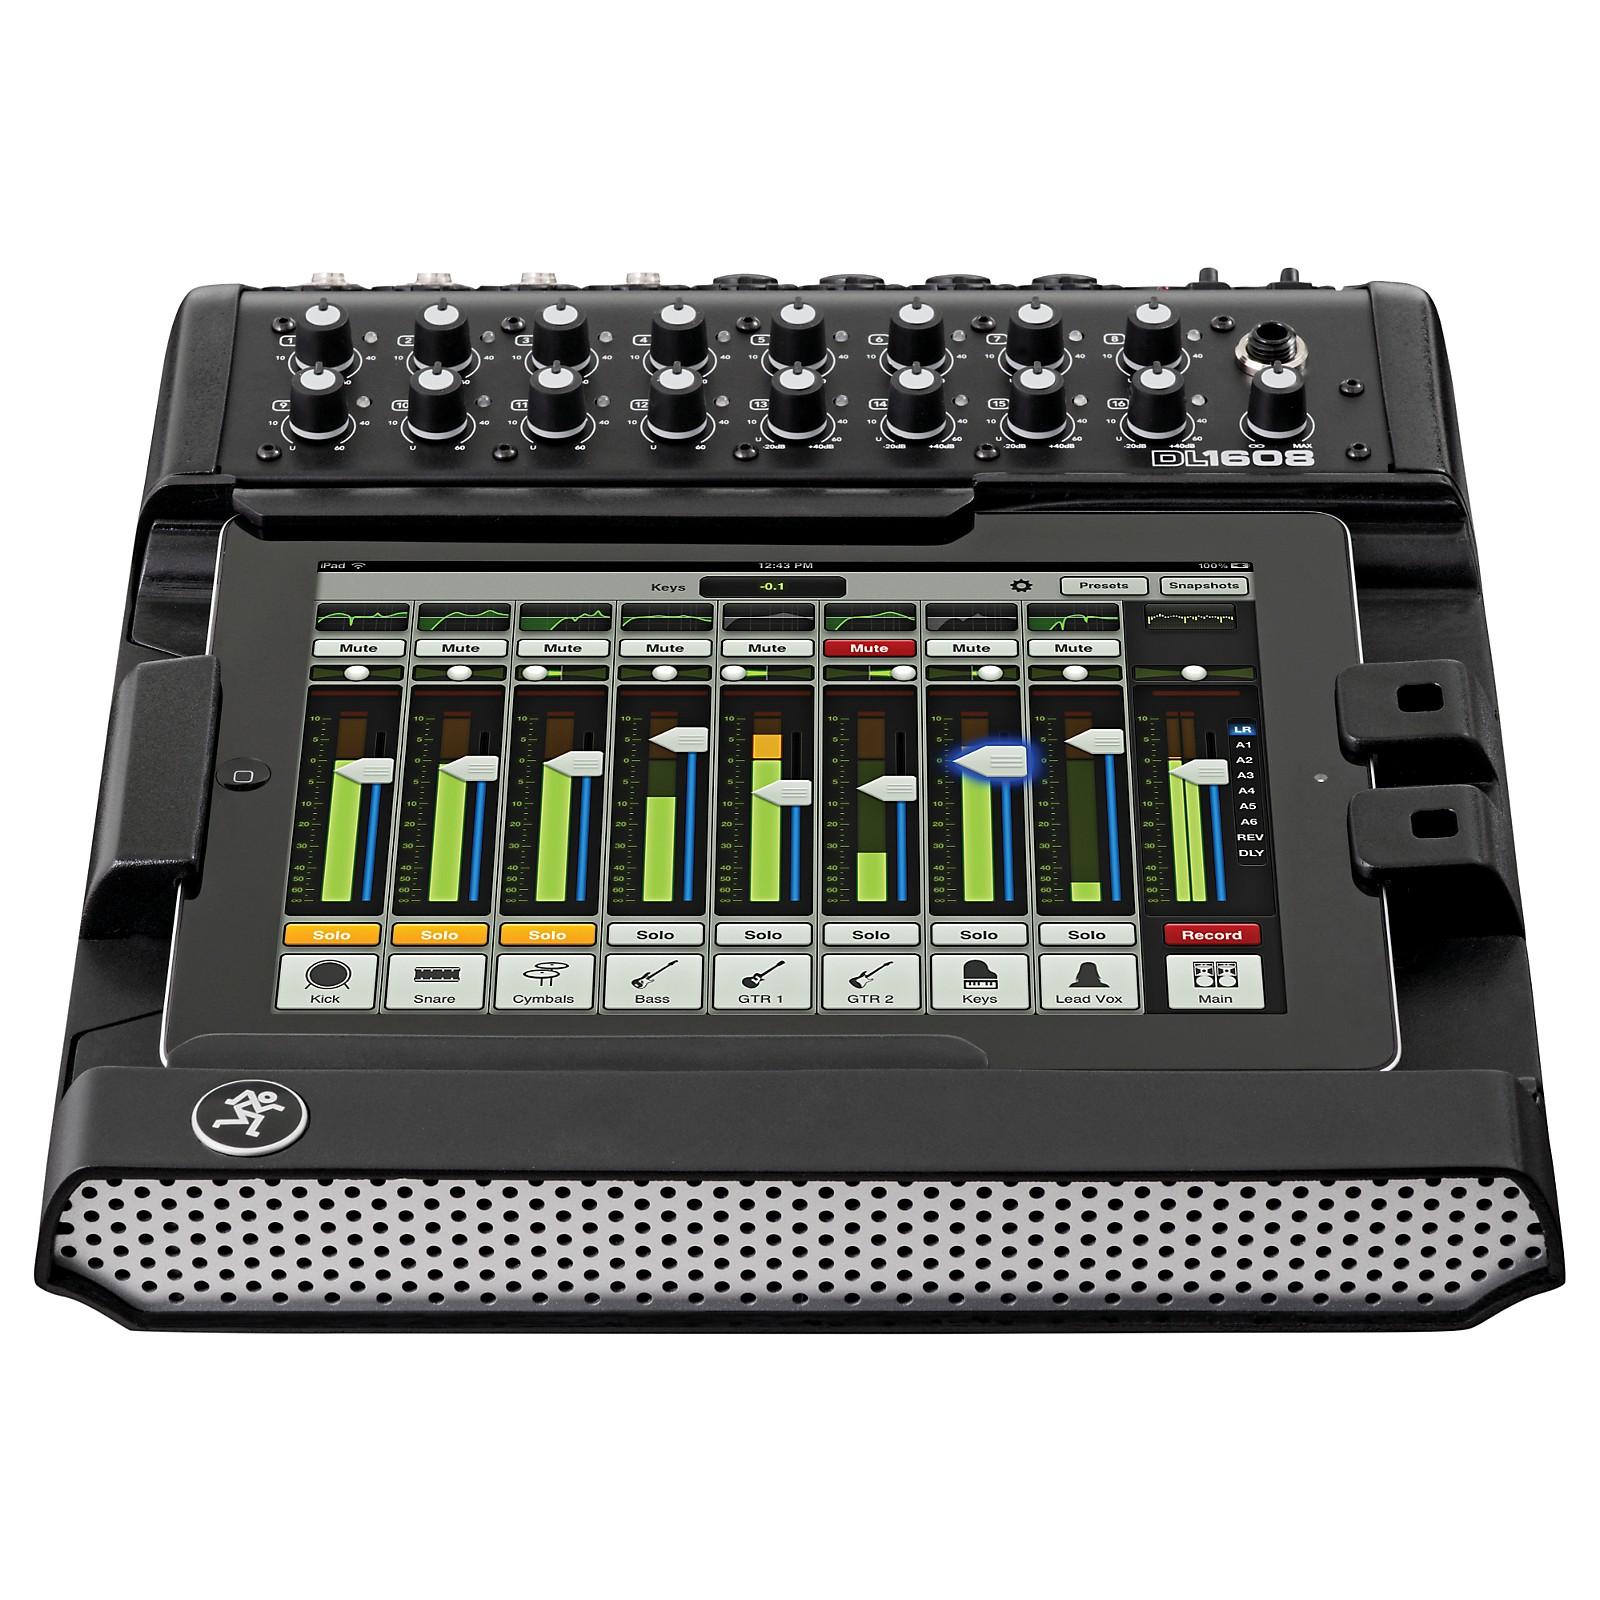 Mackie DL1608L Lightning 16-channel Digital Live Sound Mixer w/ iPad Control